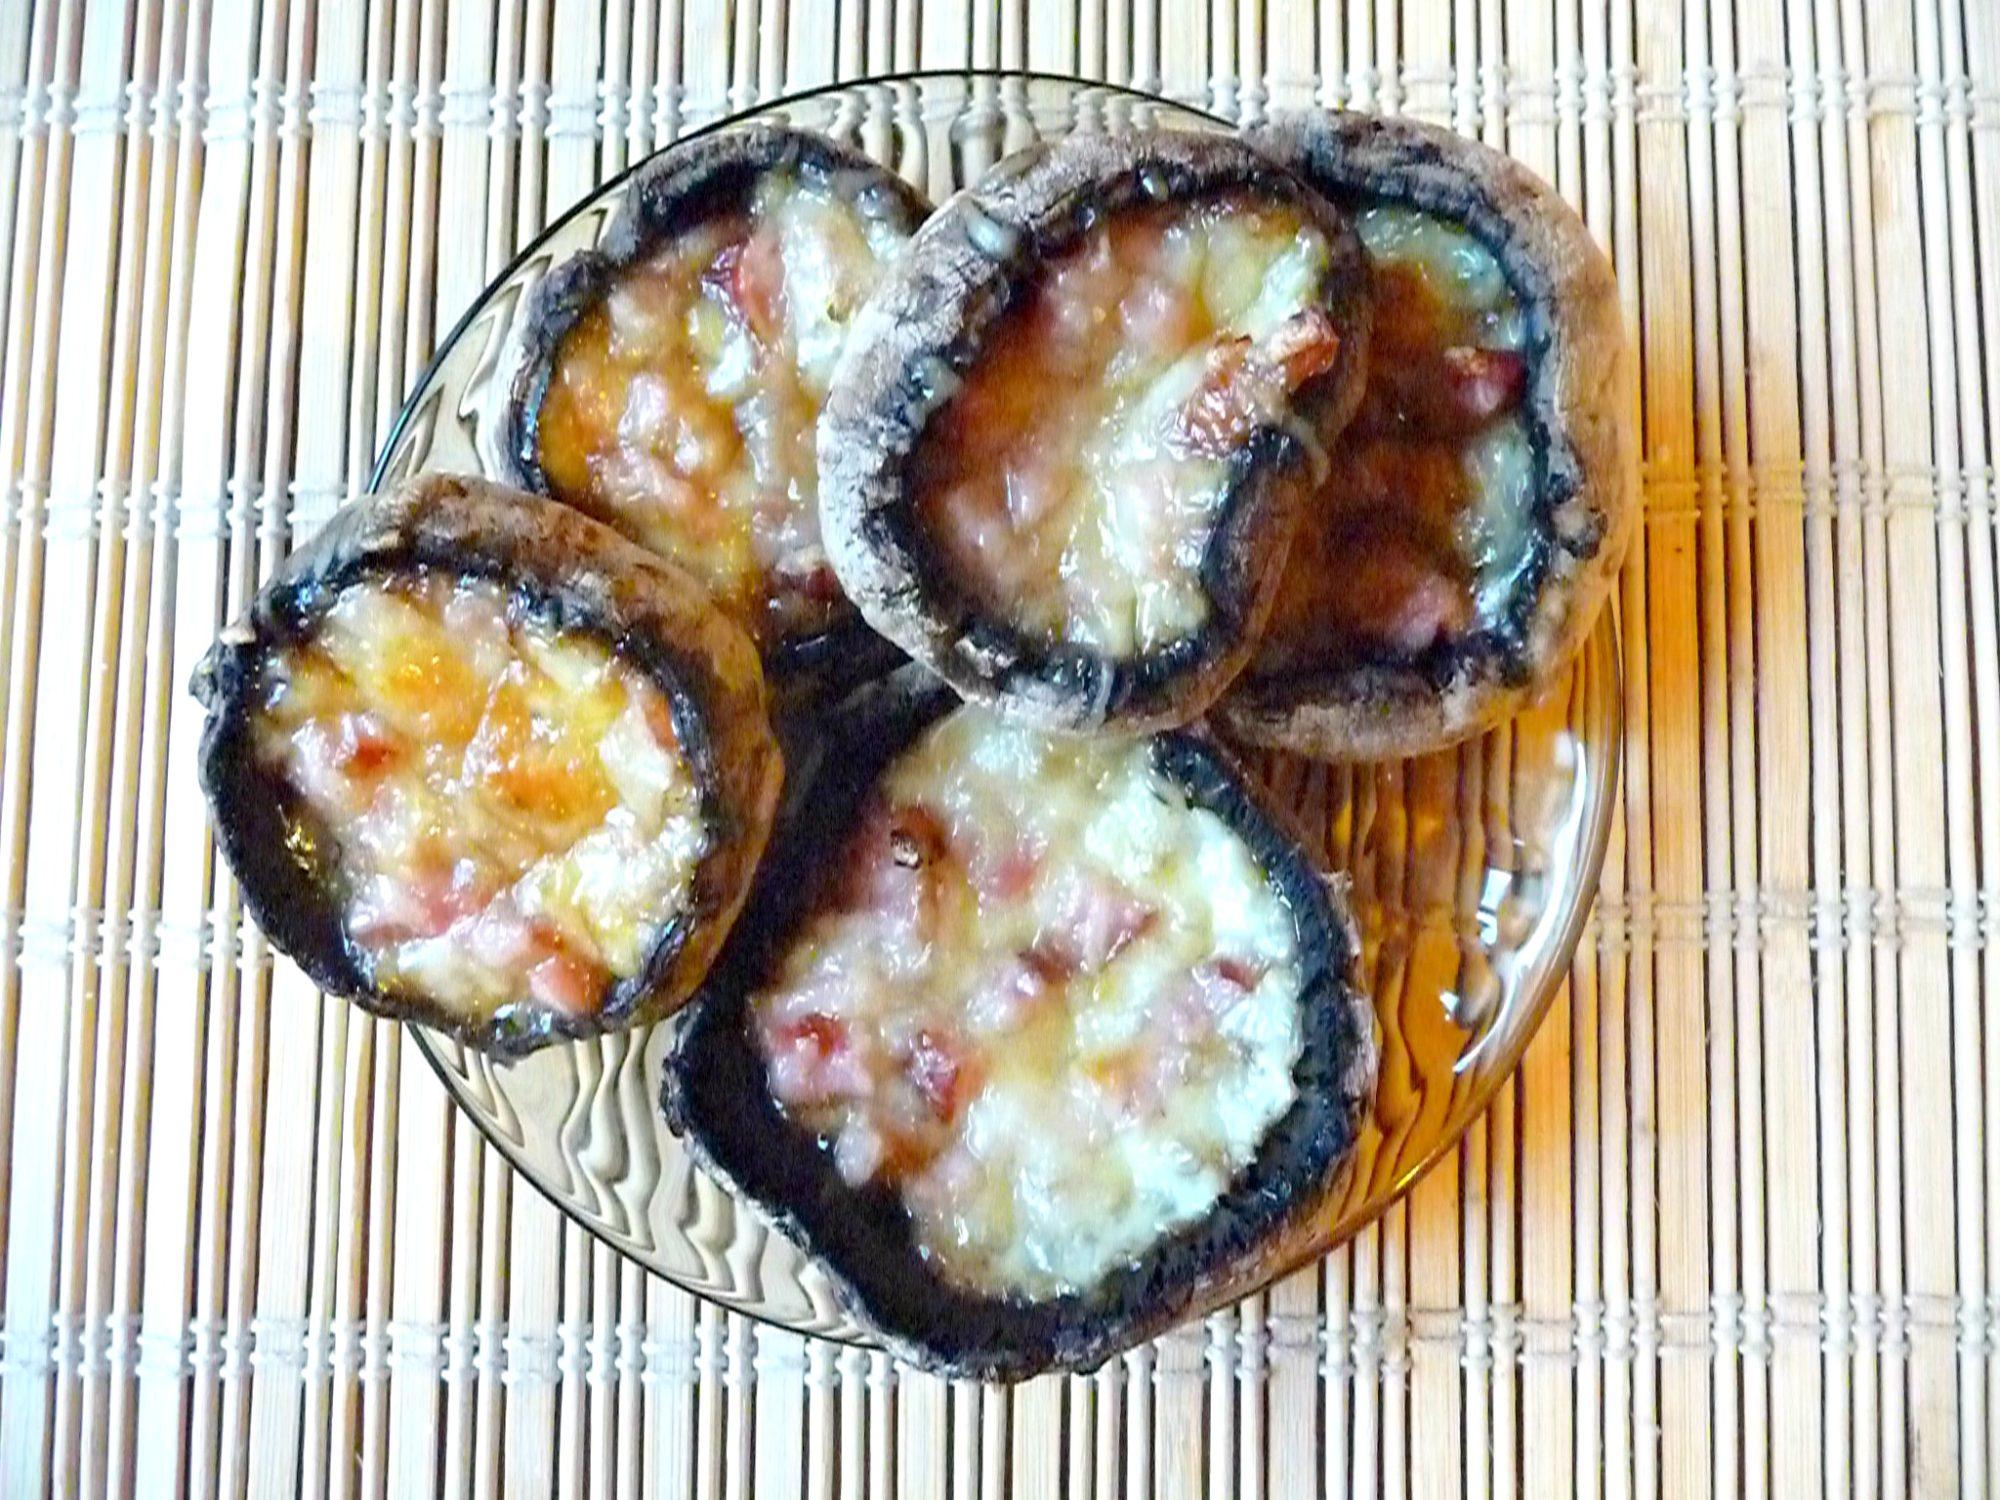 Easy stuffed mushrooms appetizer